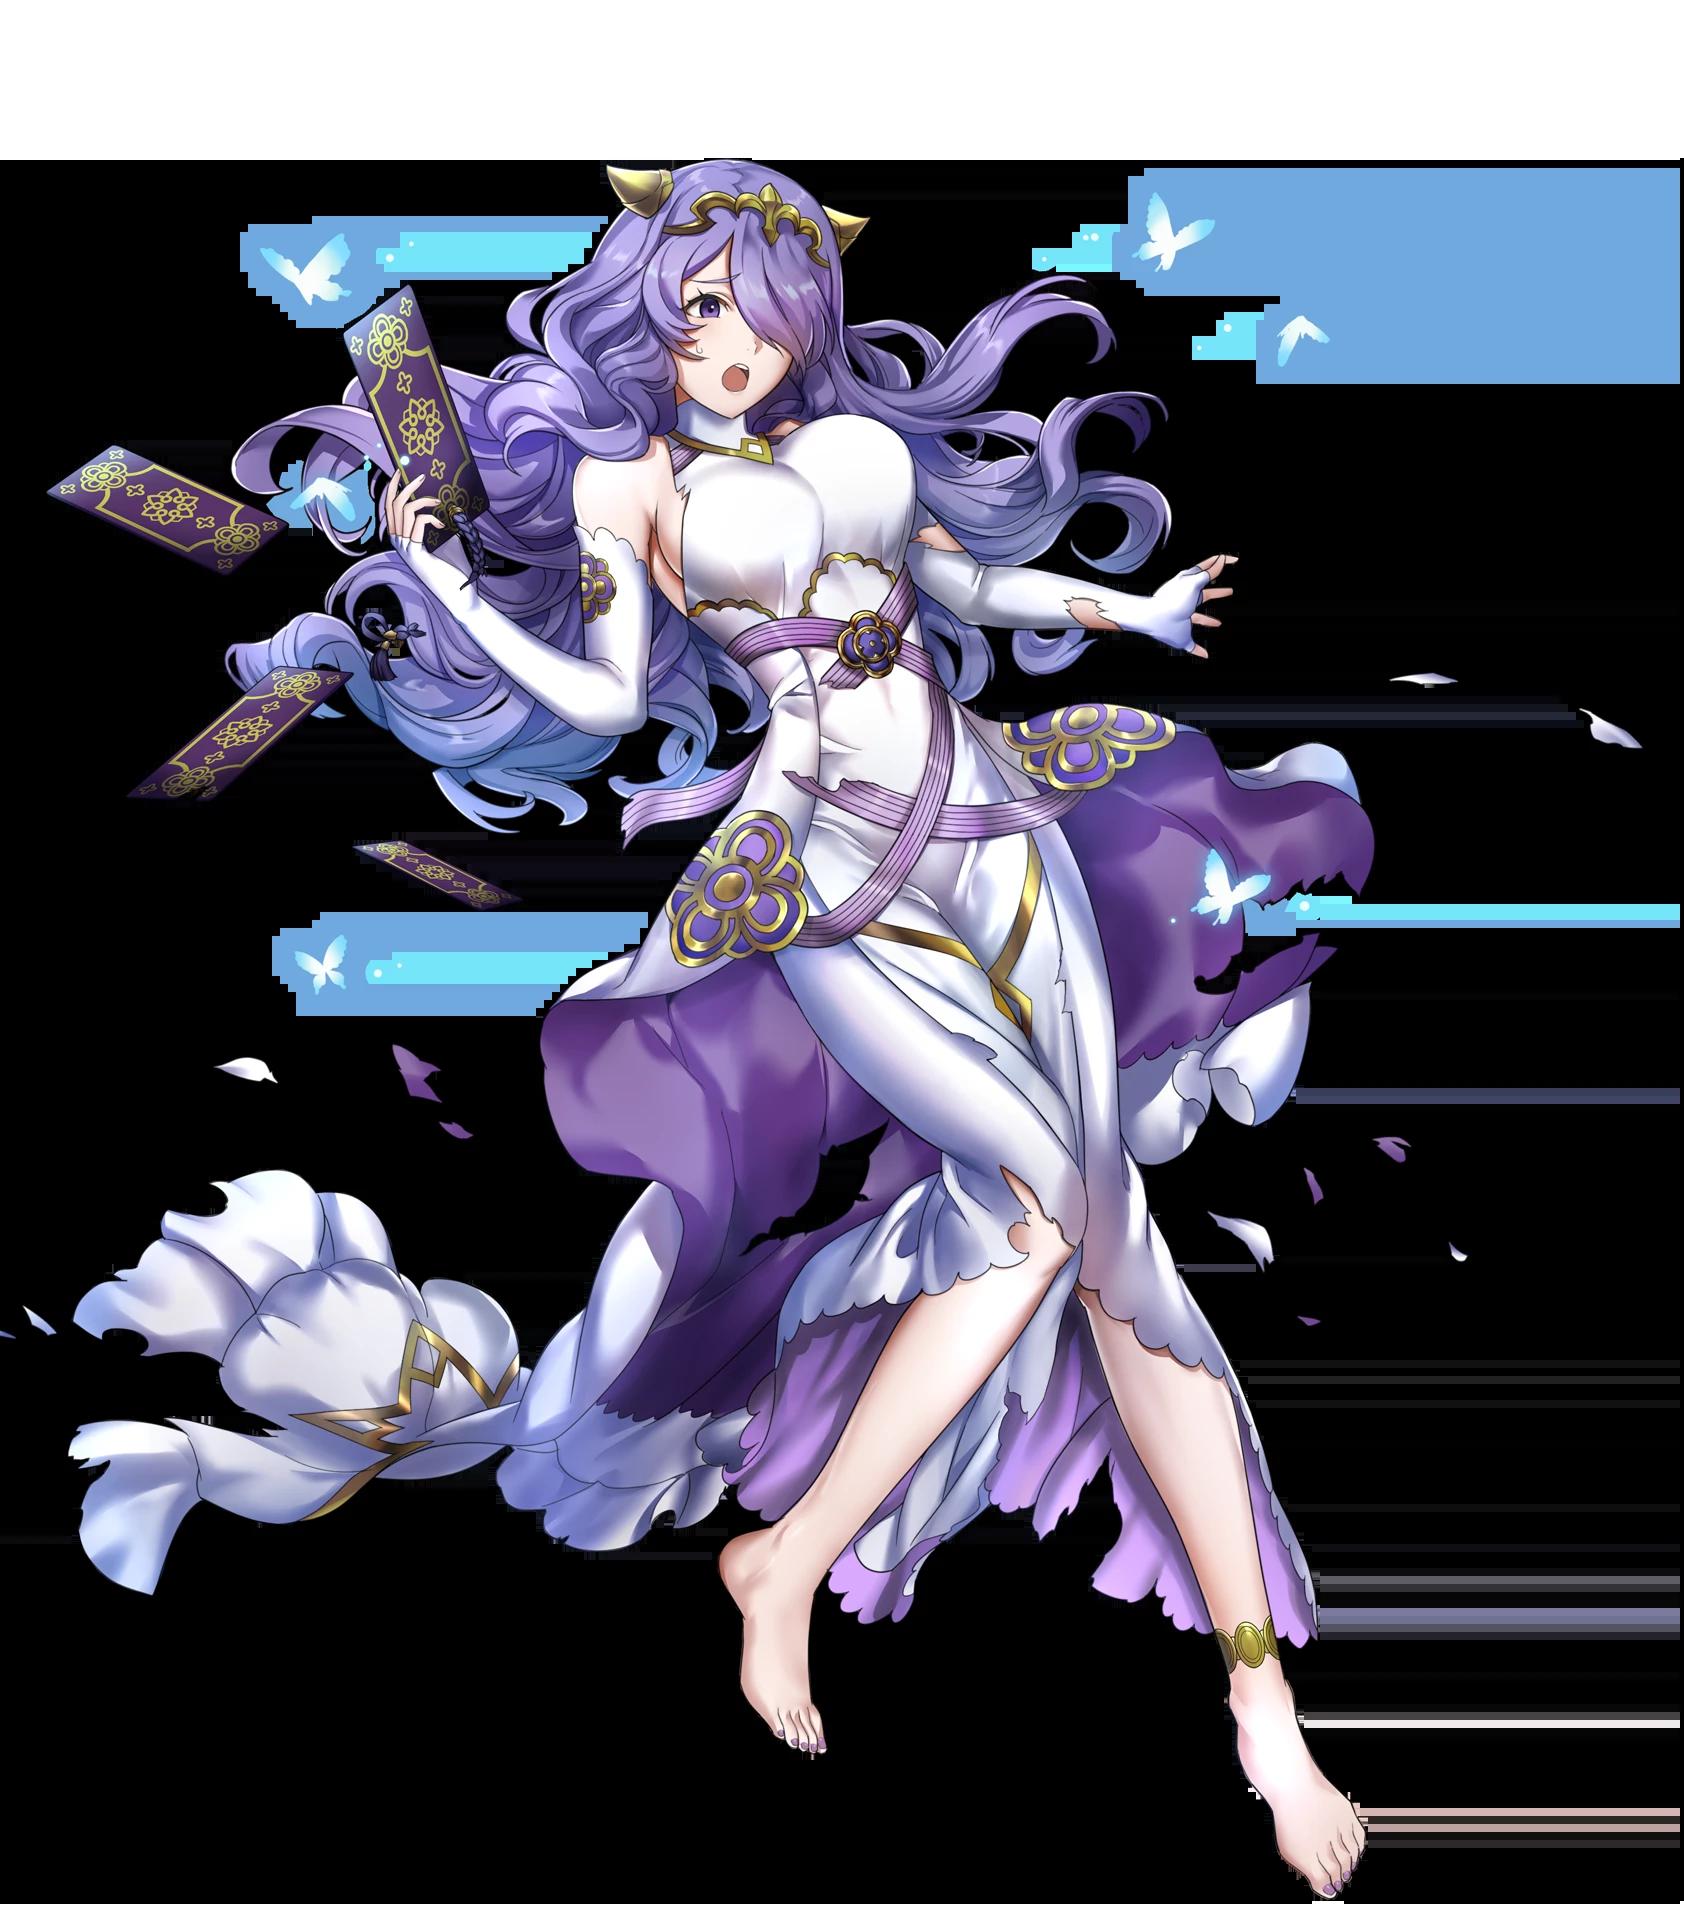 https://static.wikia.nocookie.net/feheroes_gamepedia_en/images/3/3c/Camilla_Flower_of_Fantasy_BtlFace_D.webp/revision/latest?cb=20190920221459&format=original